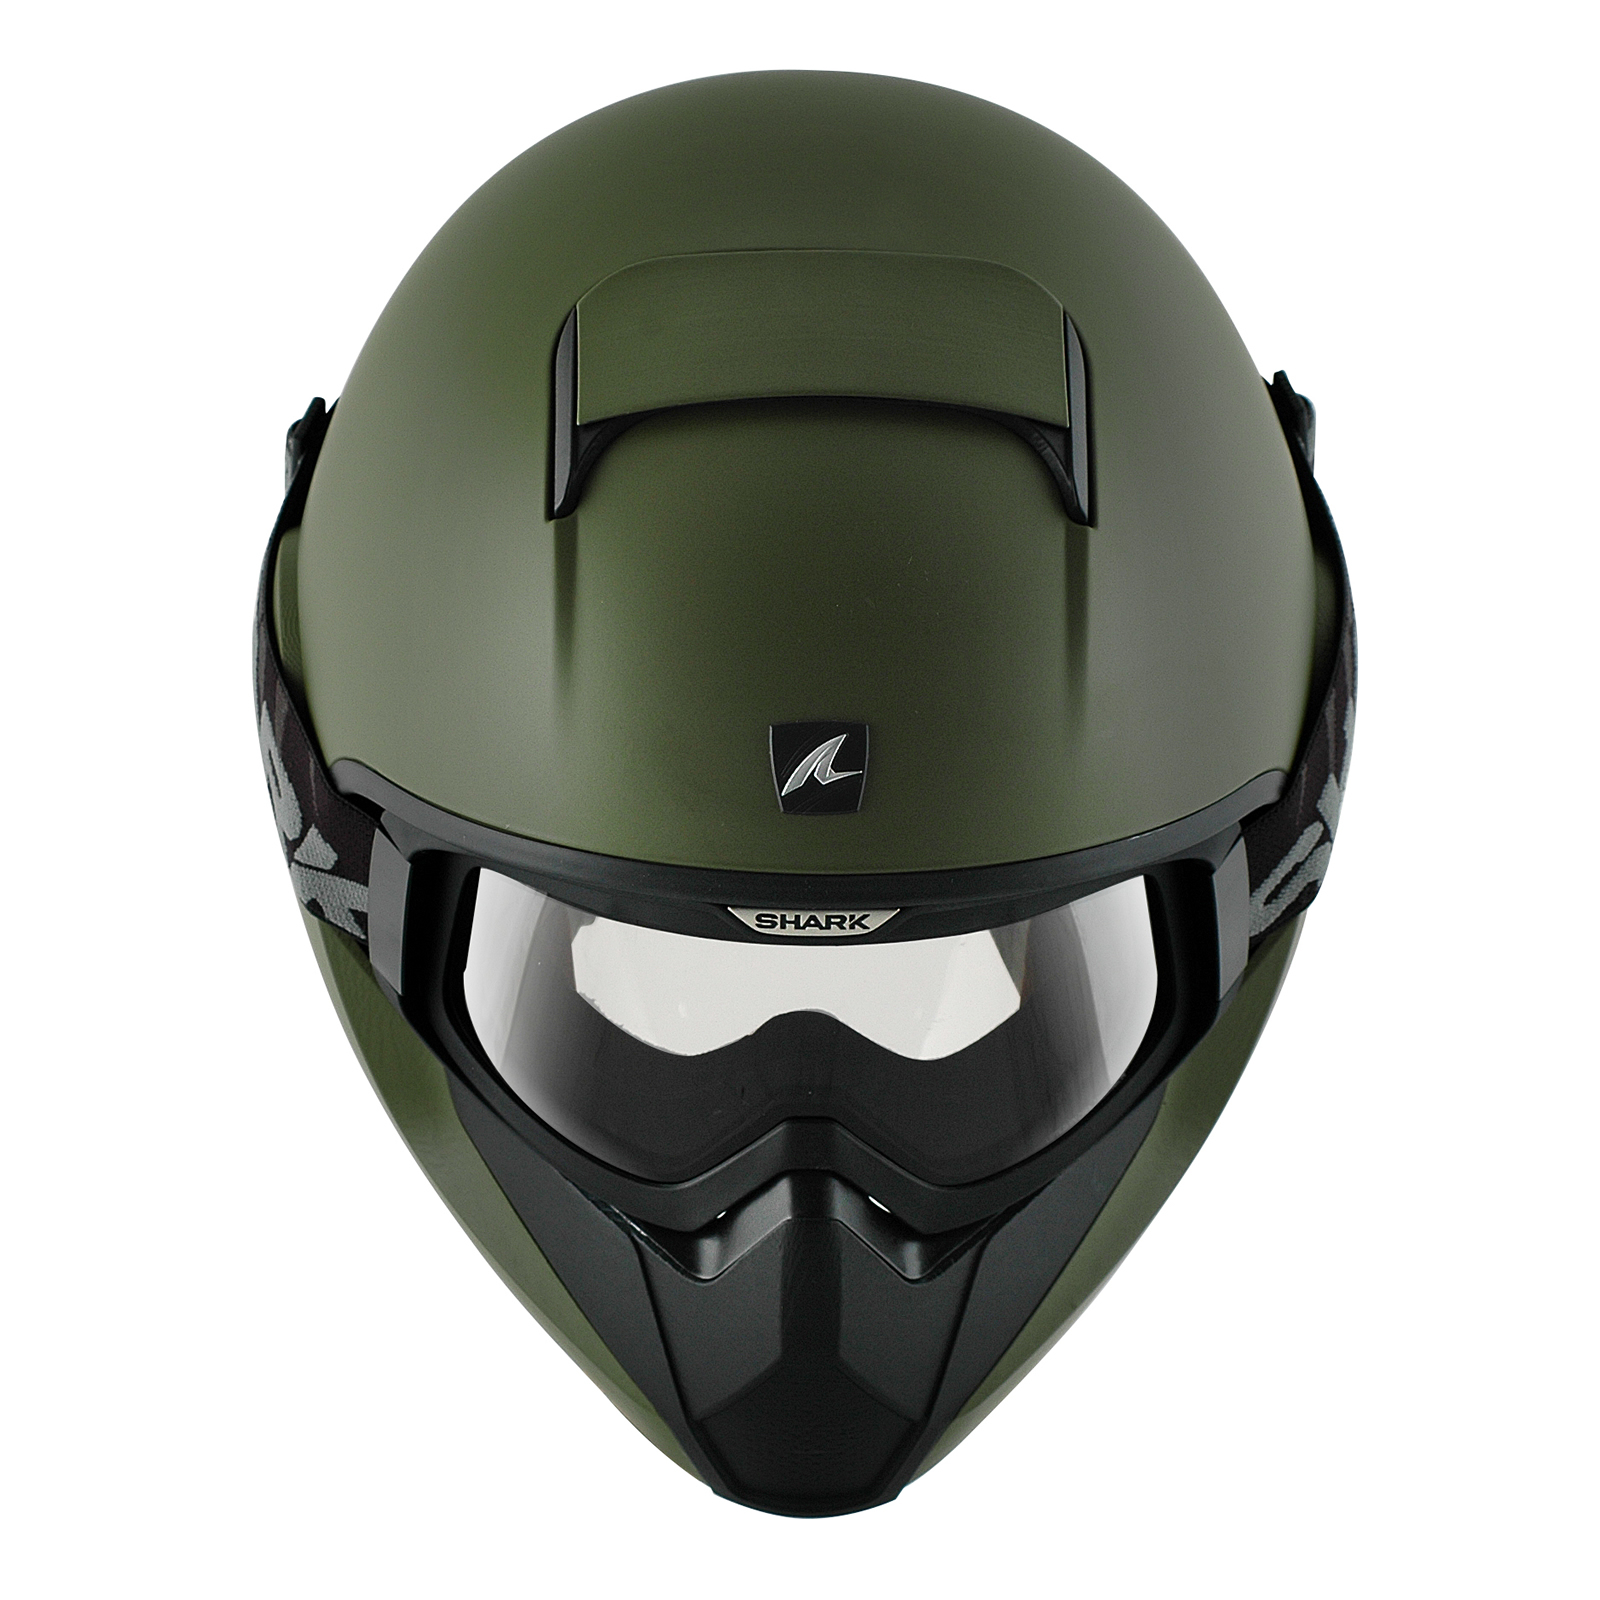 Shark vancore plain matt green motorcycle helmet army